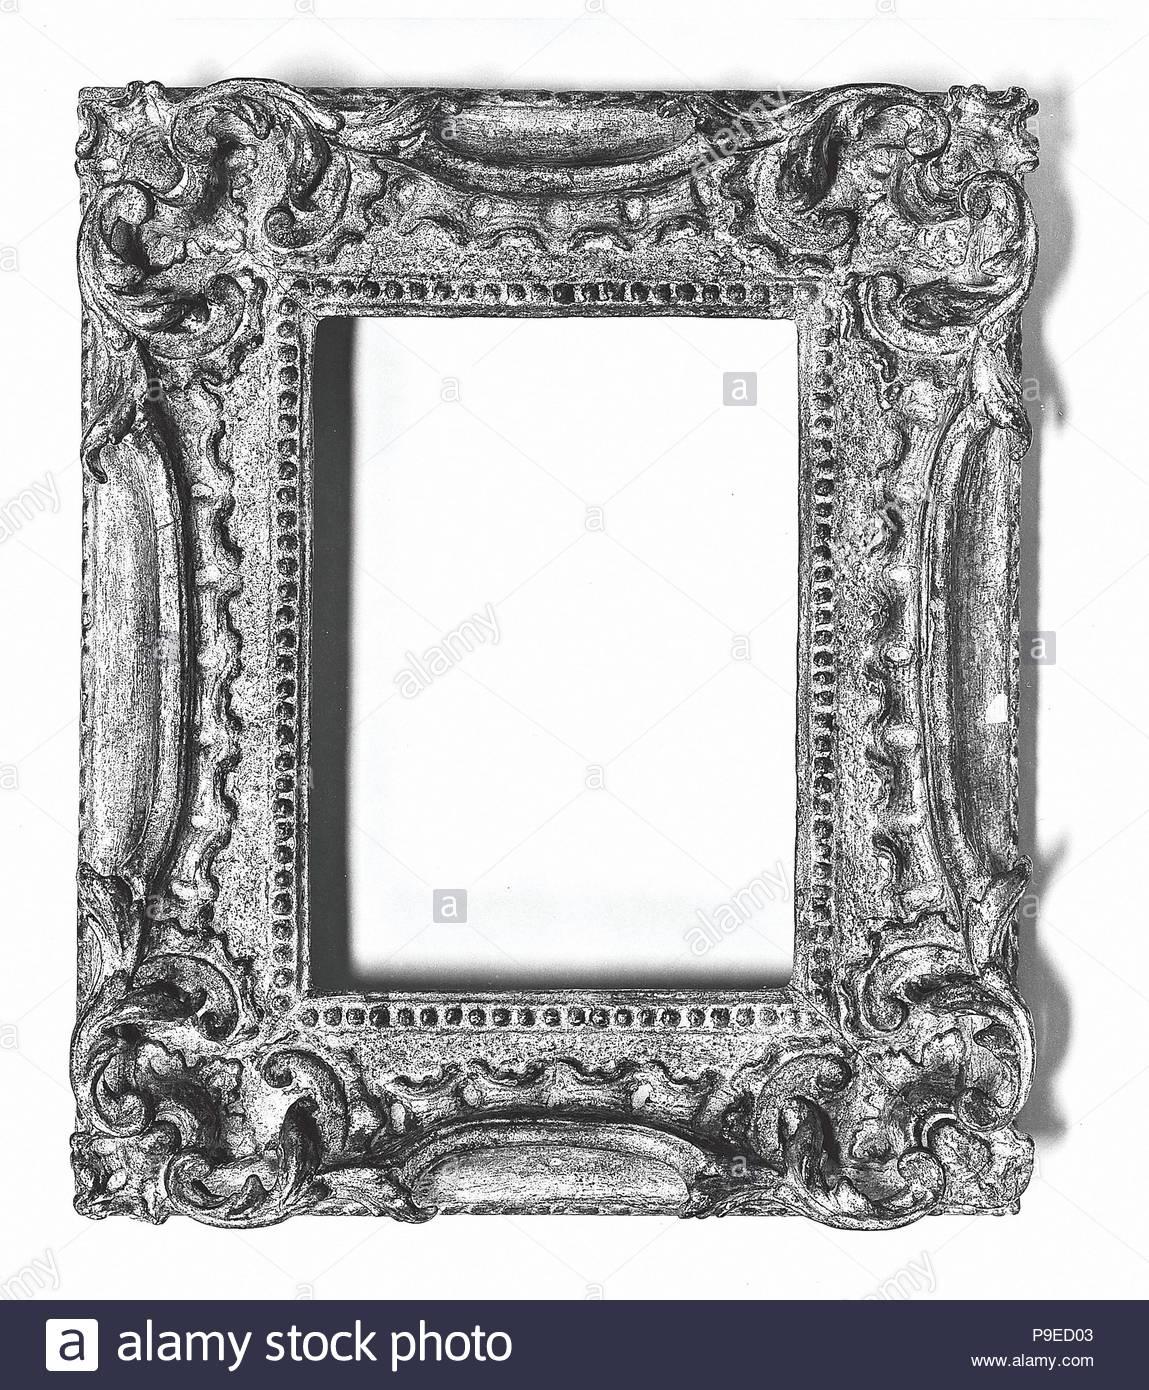 Rococo Frame Imágenes De Stock & Rococo Frame Fotos De Stock - Alamy